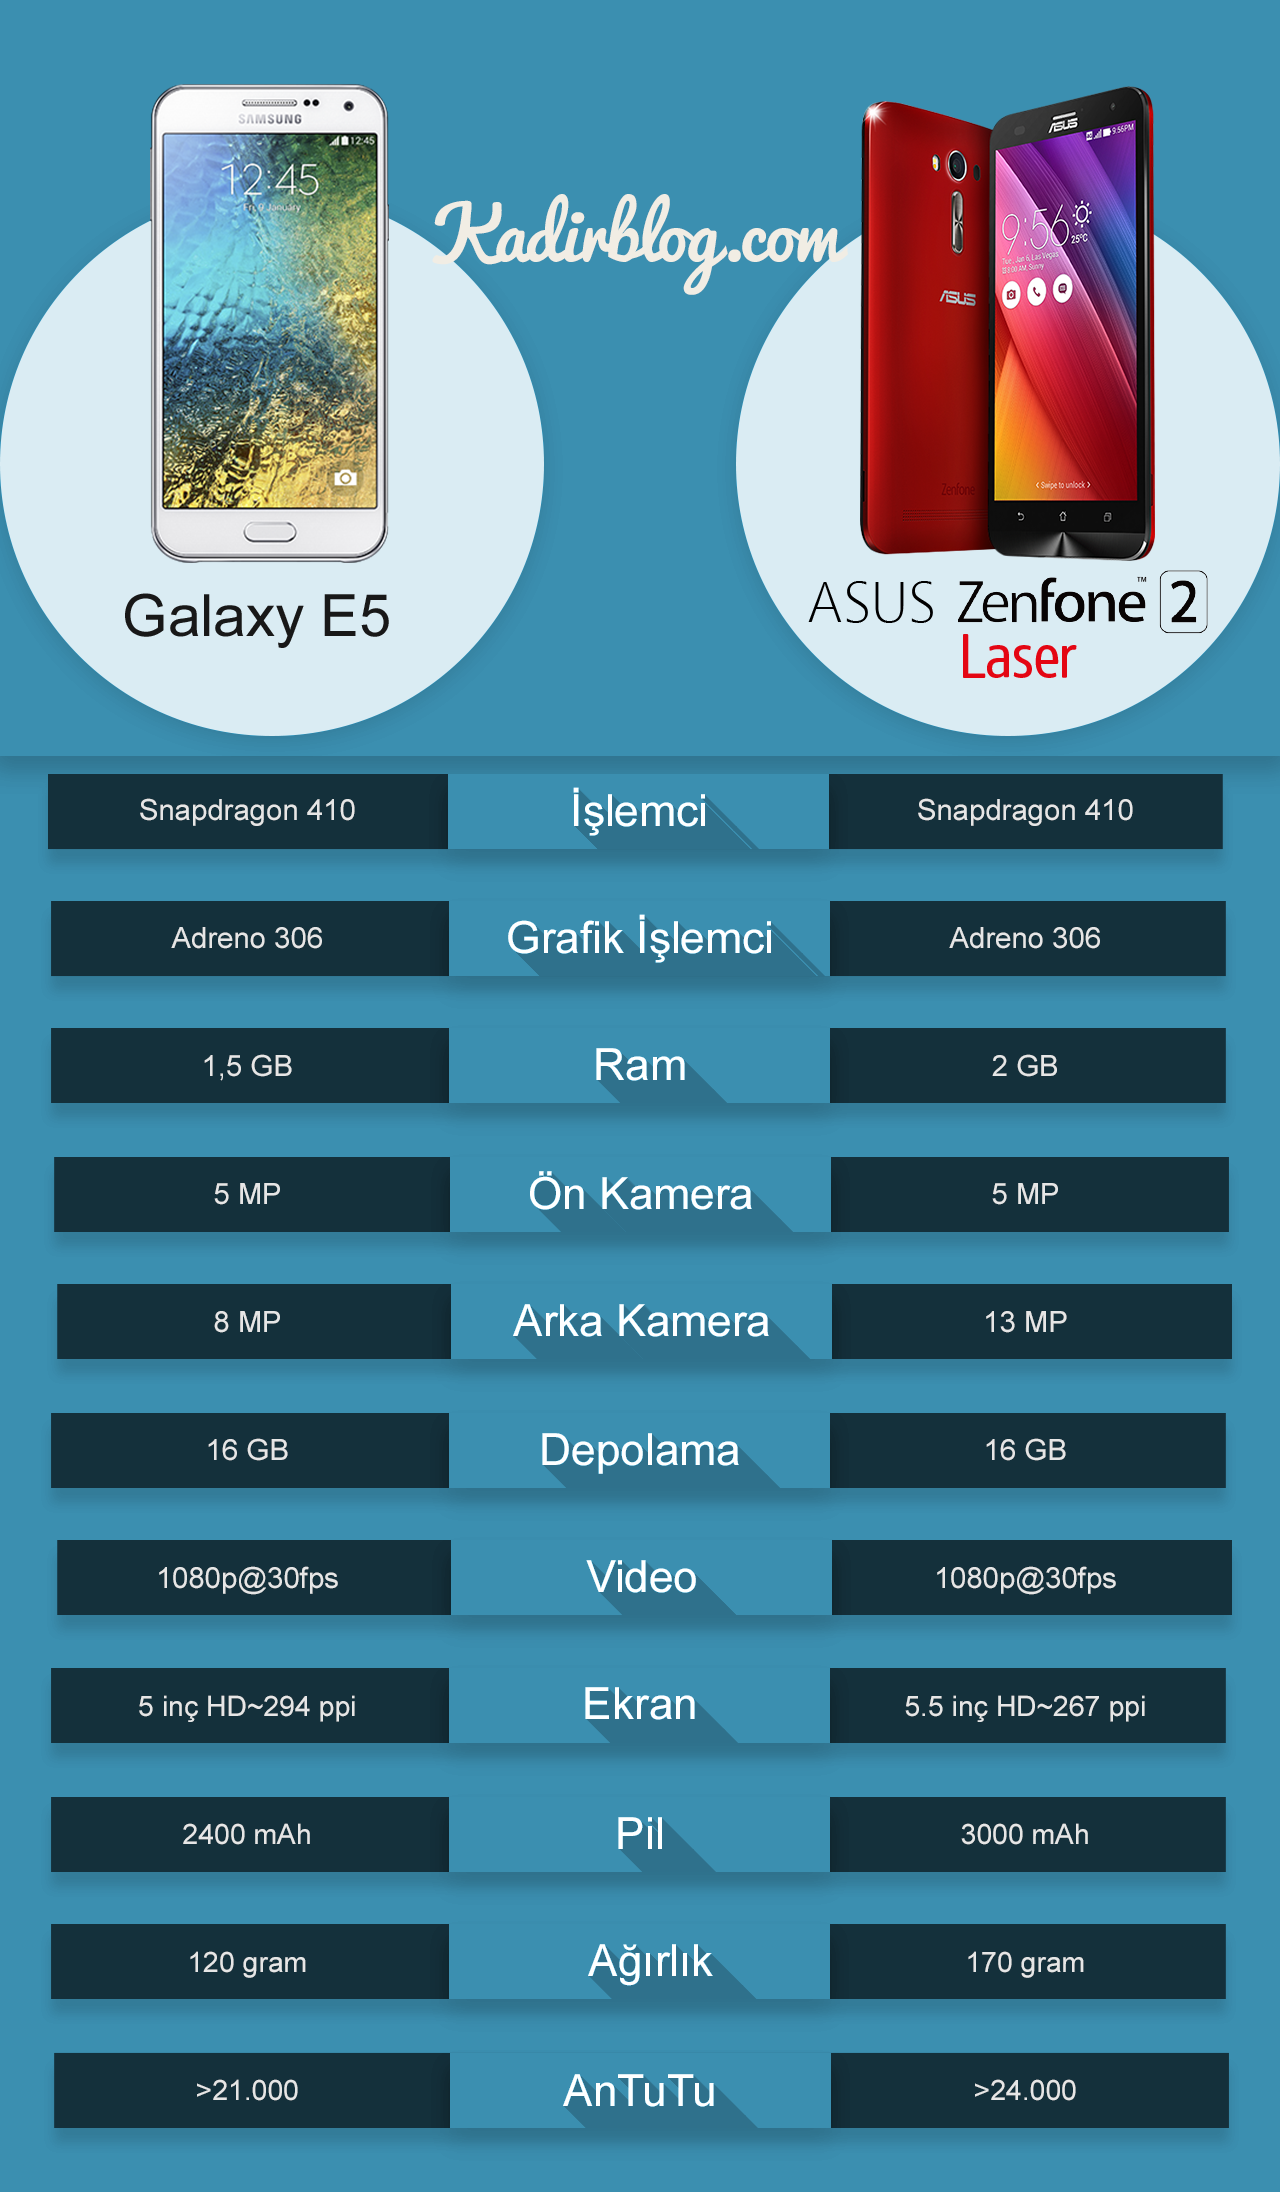 asus_zenfone_2_laser_samsung_galaxy_e5_karşılaştırma